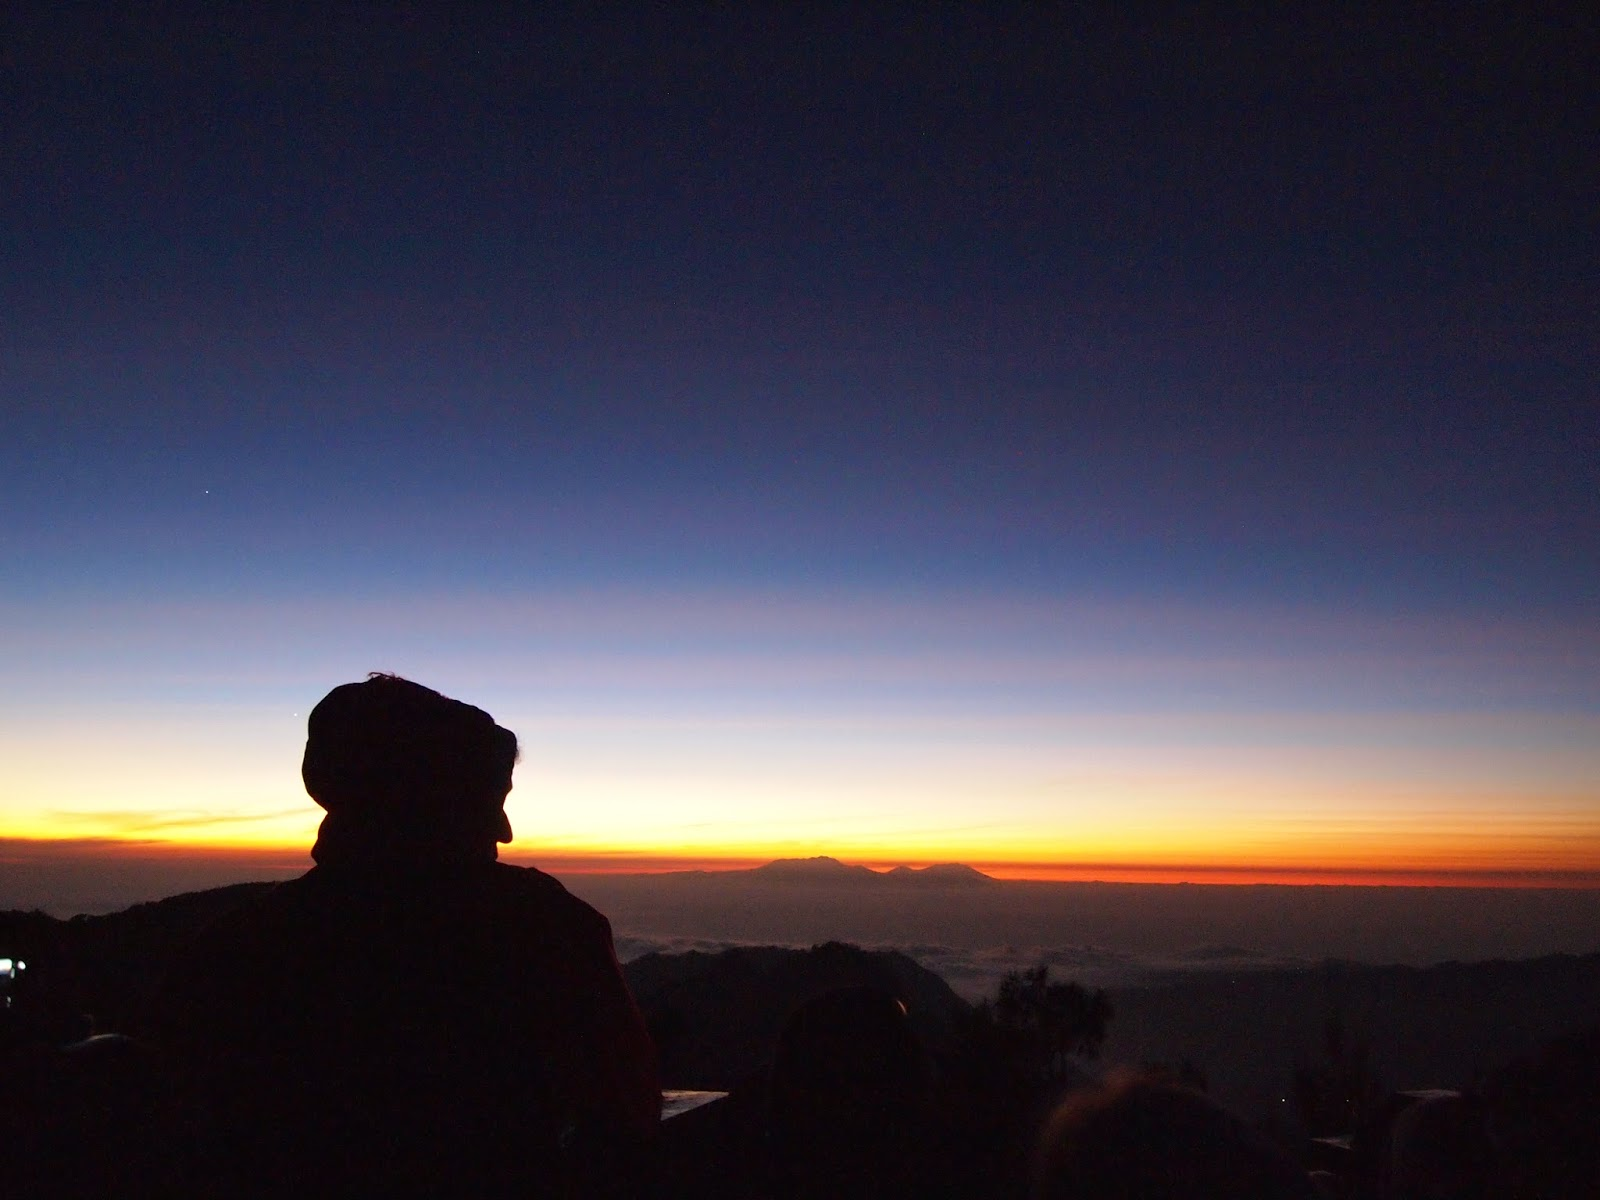 Foto ini diambil di gunung Pananjakan pada area Bromo Tengger Semeru, tempat ini merupakan lokasi terbaik untuk melihat Sunrise dengan latar belakang gunung Bromo.